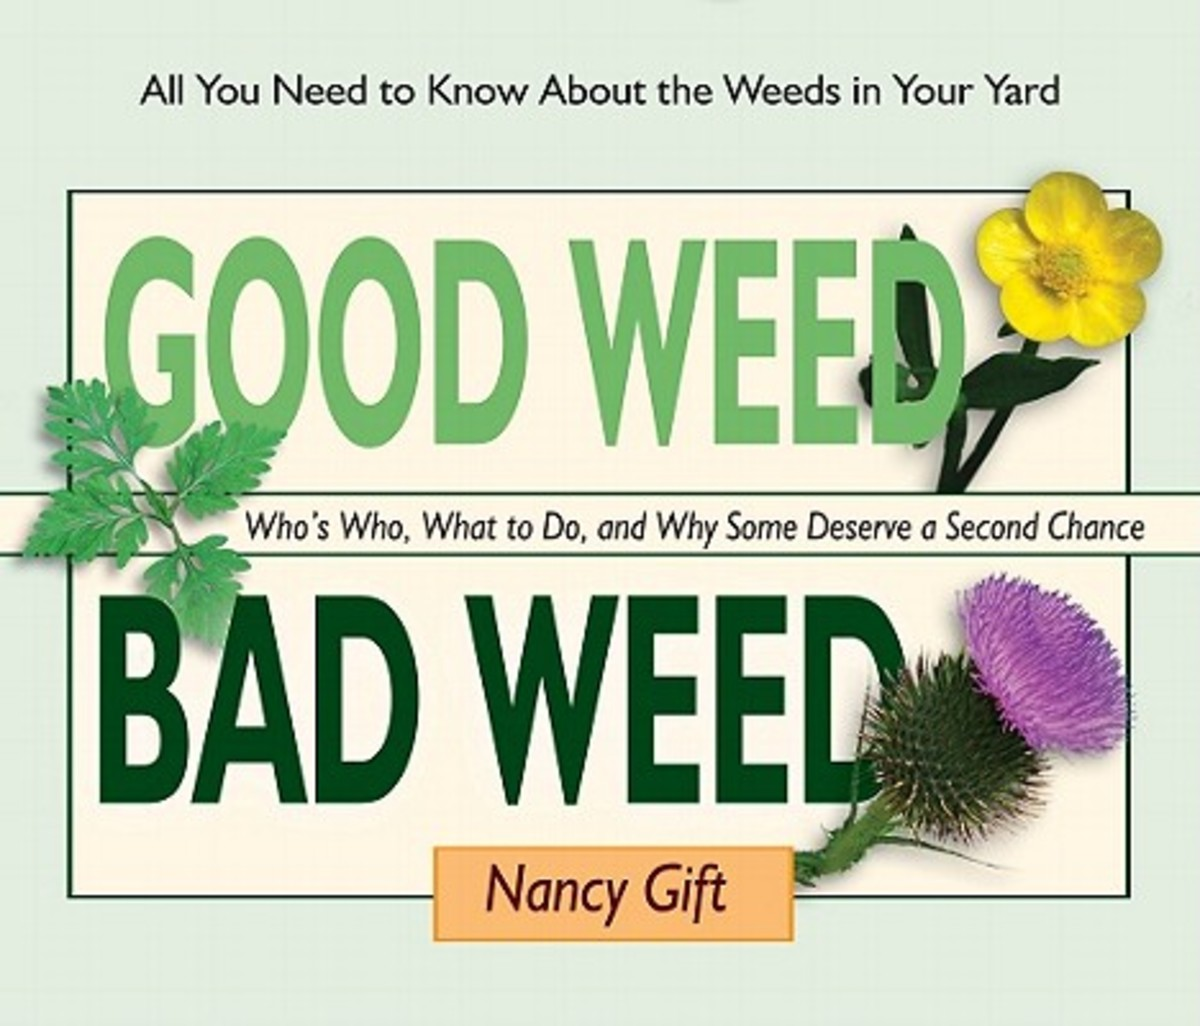 Good-Weed-Bad-Weed-Gift-Nancy